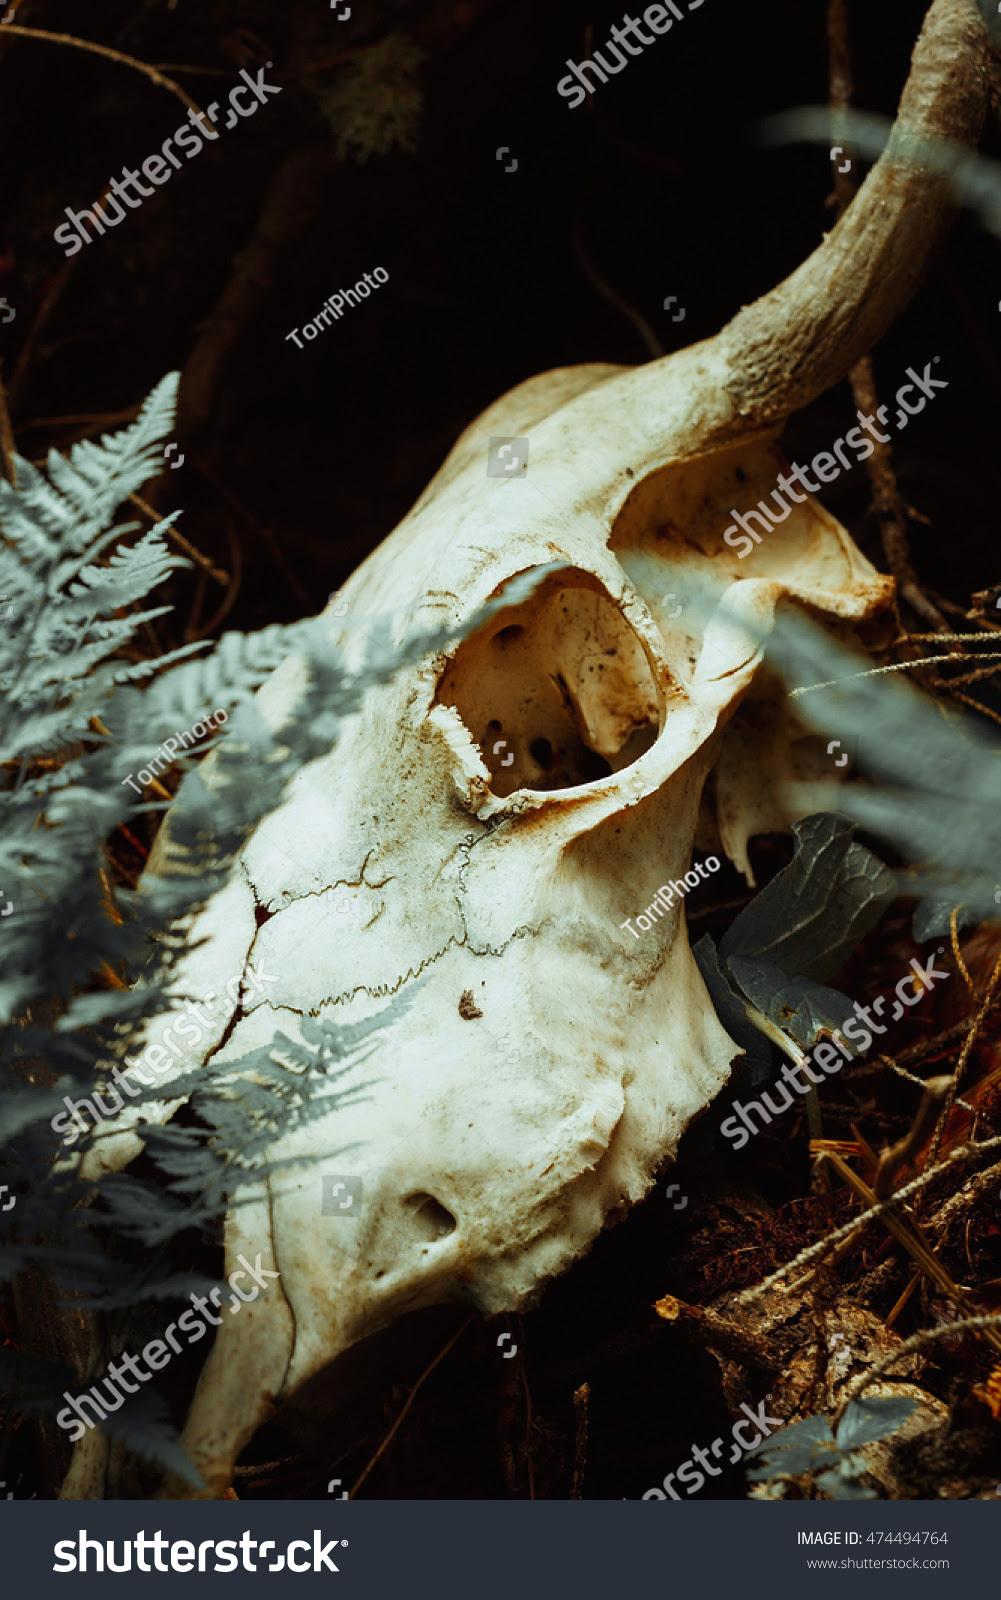 Closeup bull skull among fern leaves. Vintage toned faded image